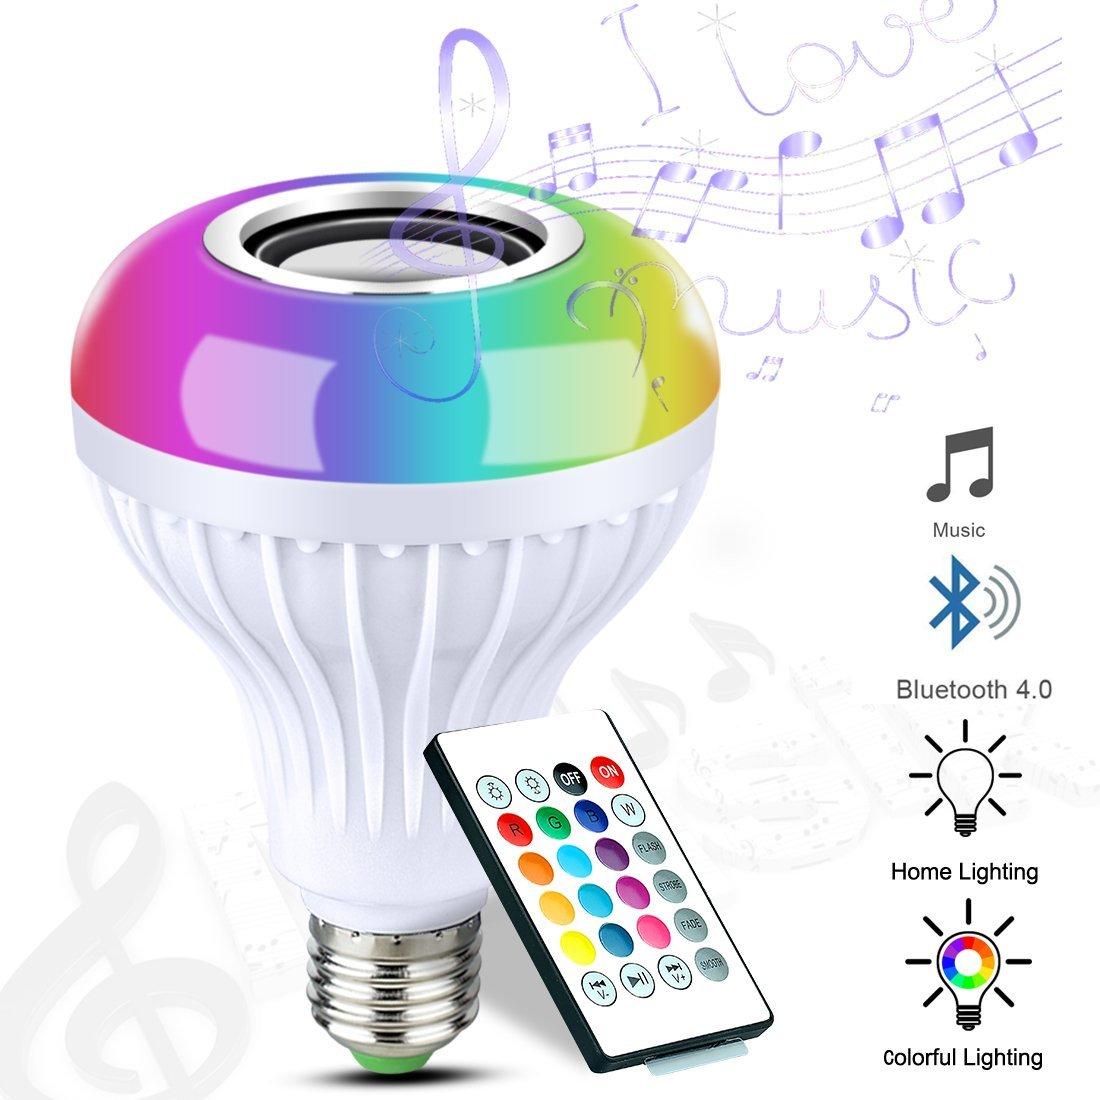 Bluetooth RGB Lightbulb (Audio-Capable) $8.99